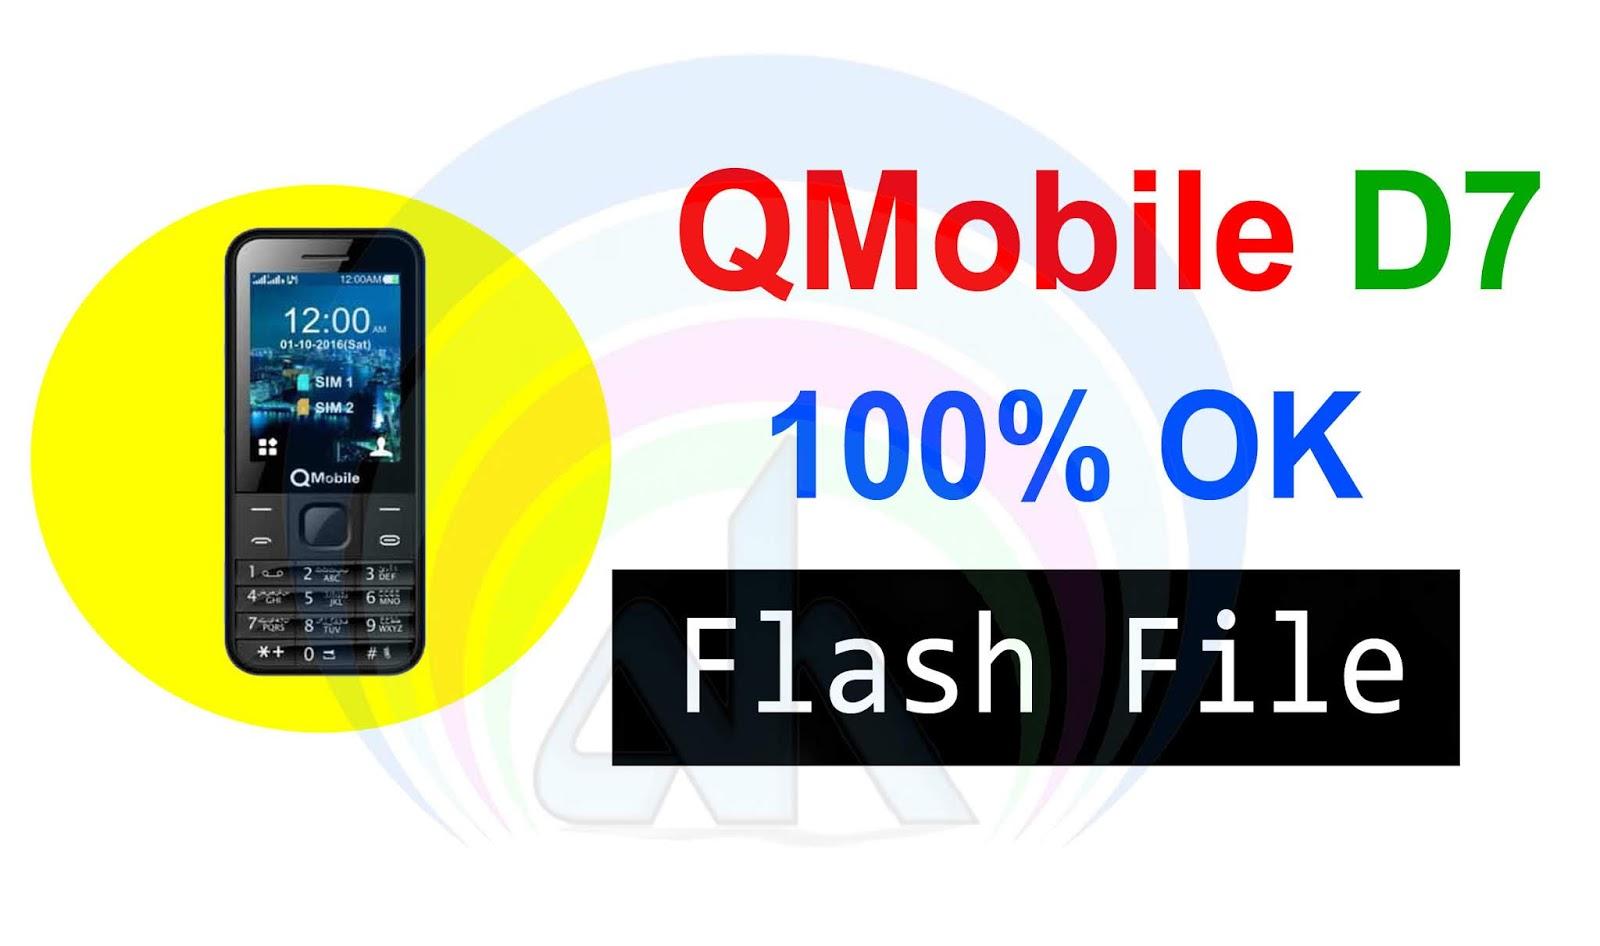 QMobile D7 MT6261 Flash File 100% Ok Working - AH Mobile